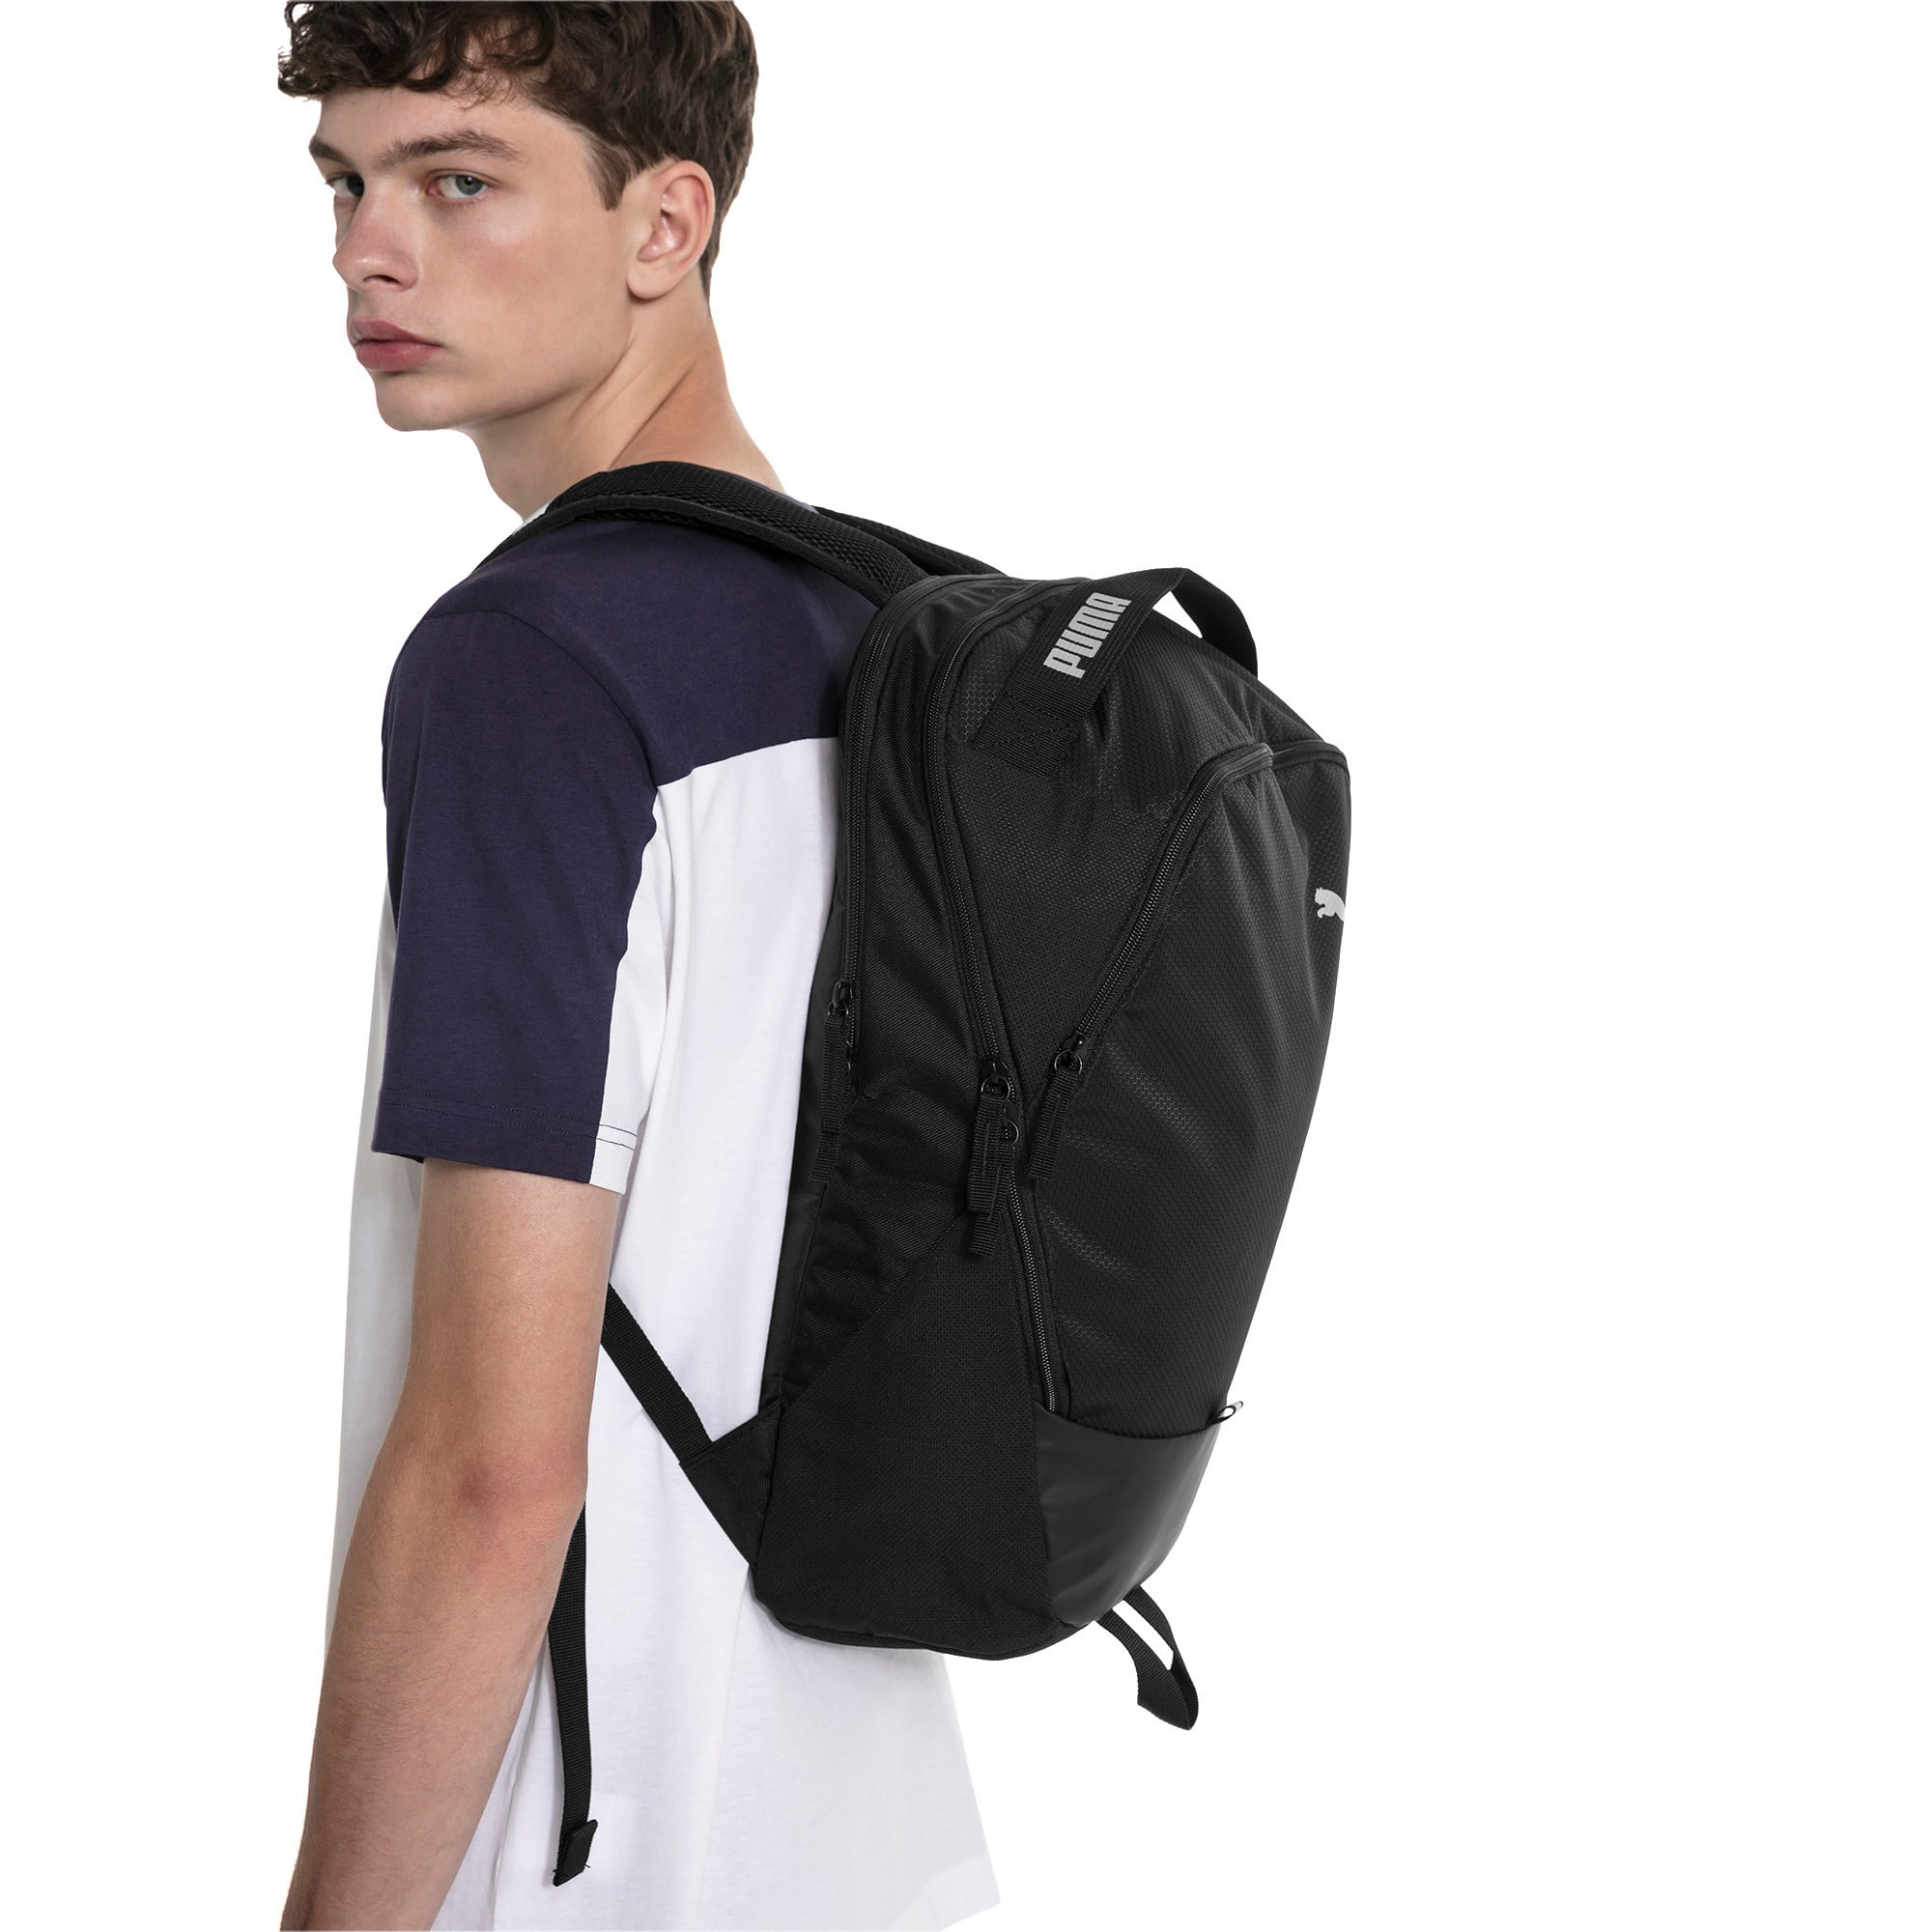 Thumbnail 4 of PUMA X Backpack, Puma Black, medium